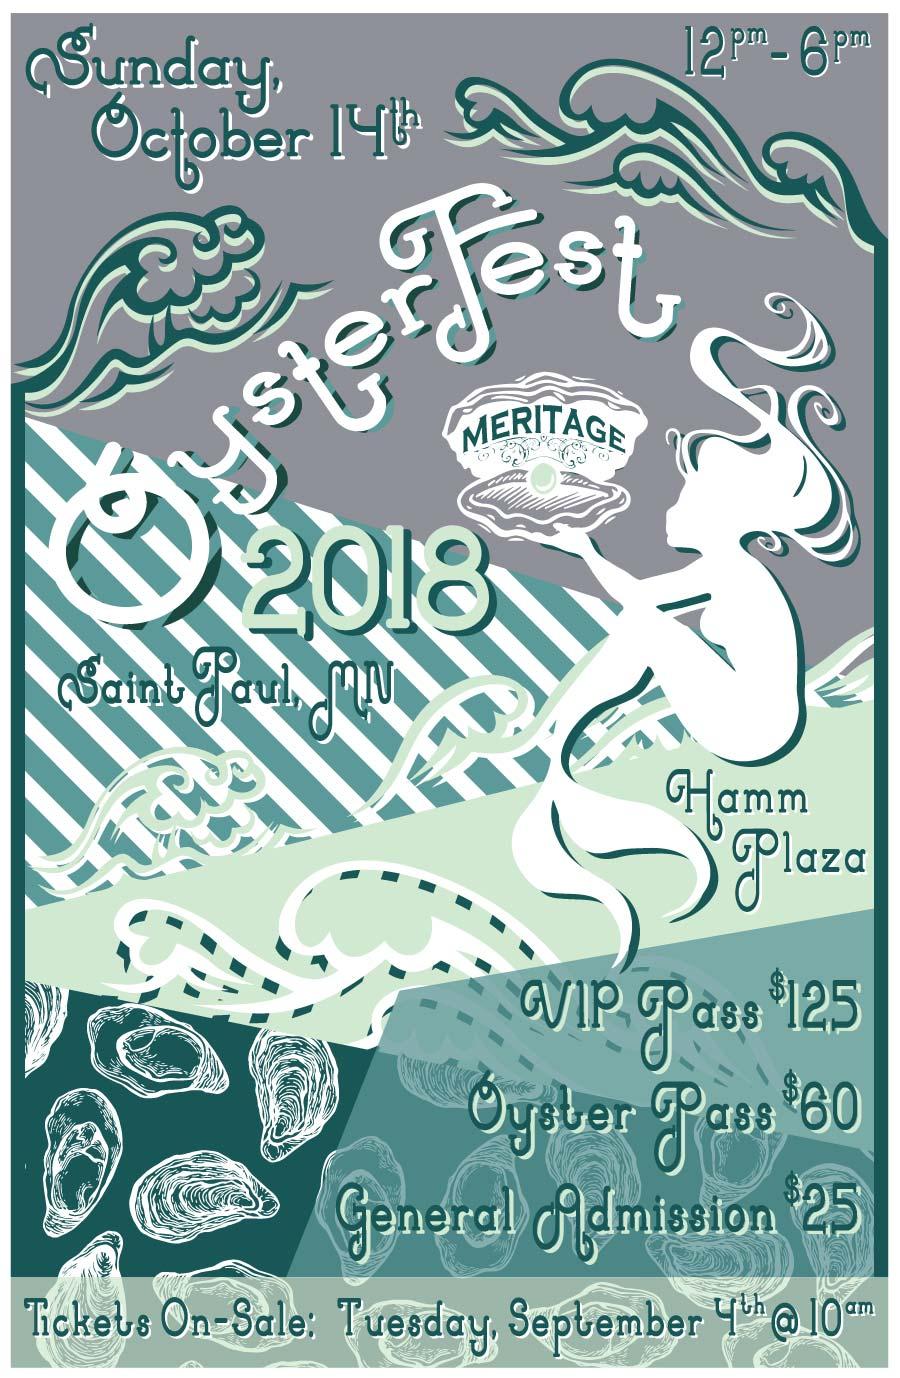 Oysterfest 2018_NewsletterImage-01.jpg